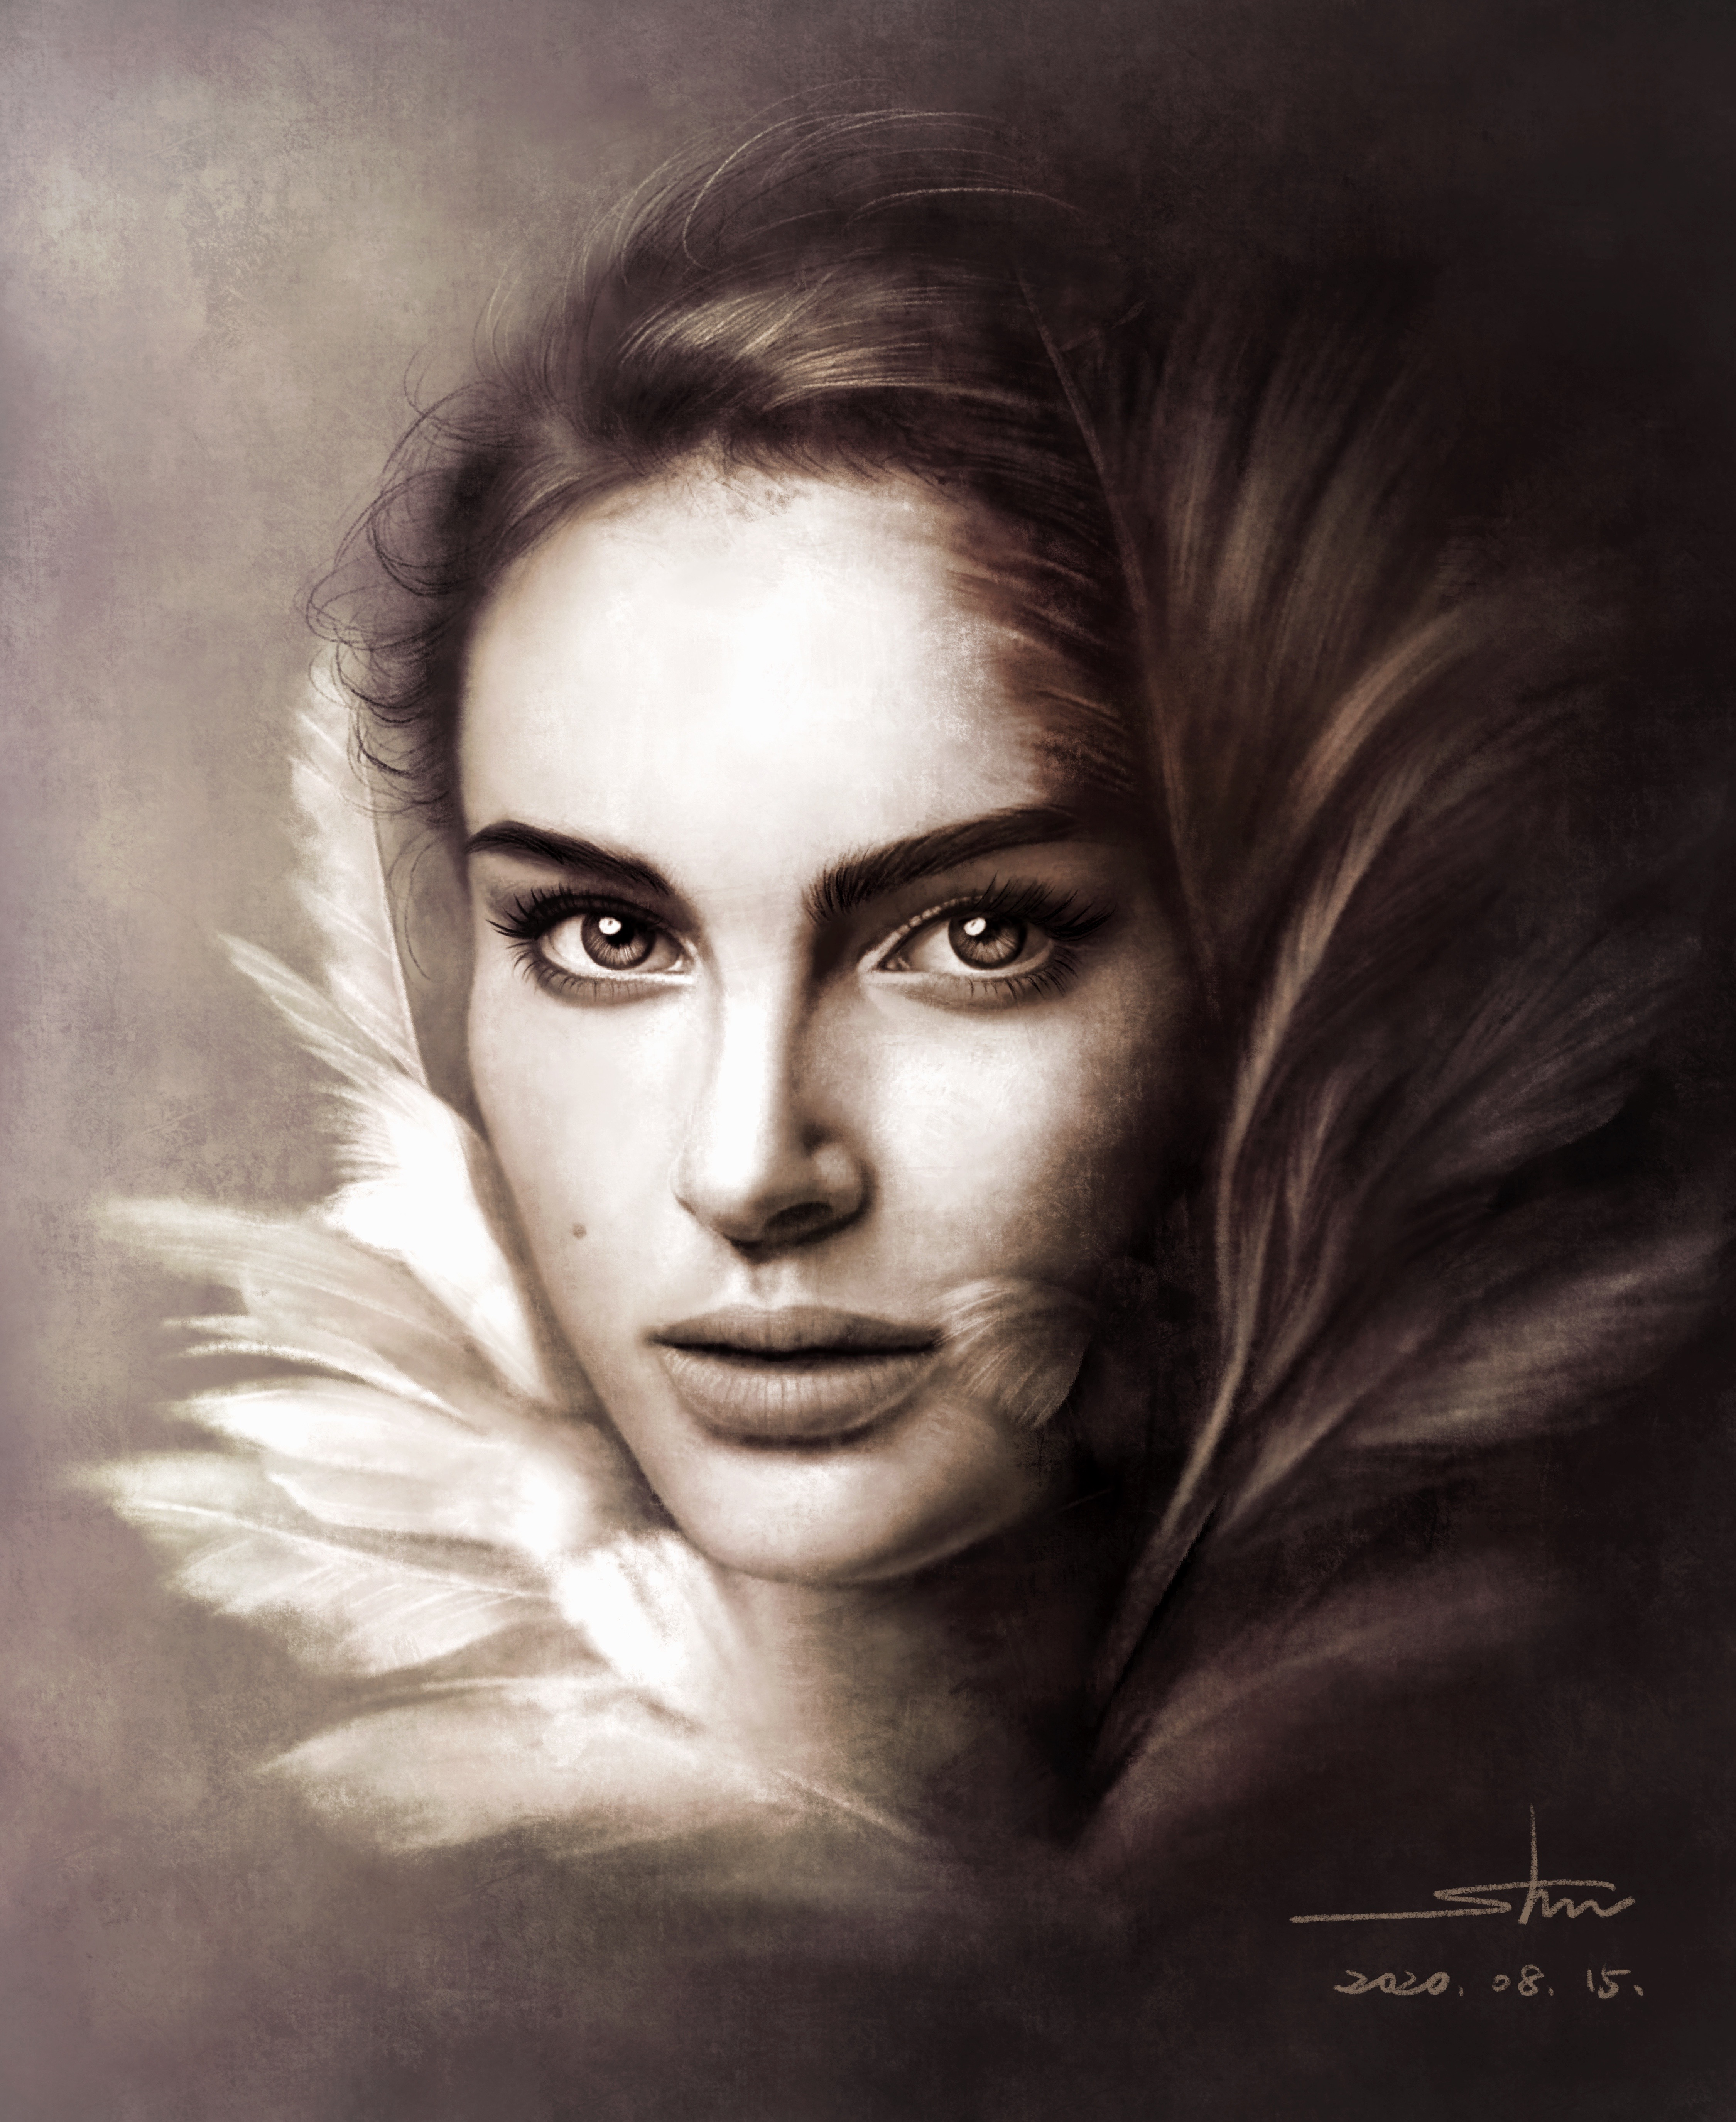 Digital Drawing of Natalie Portman